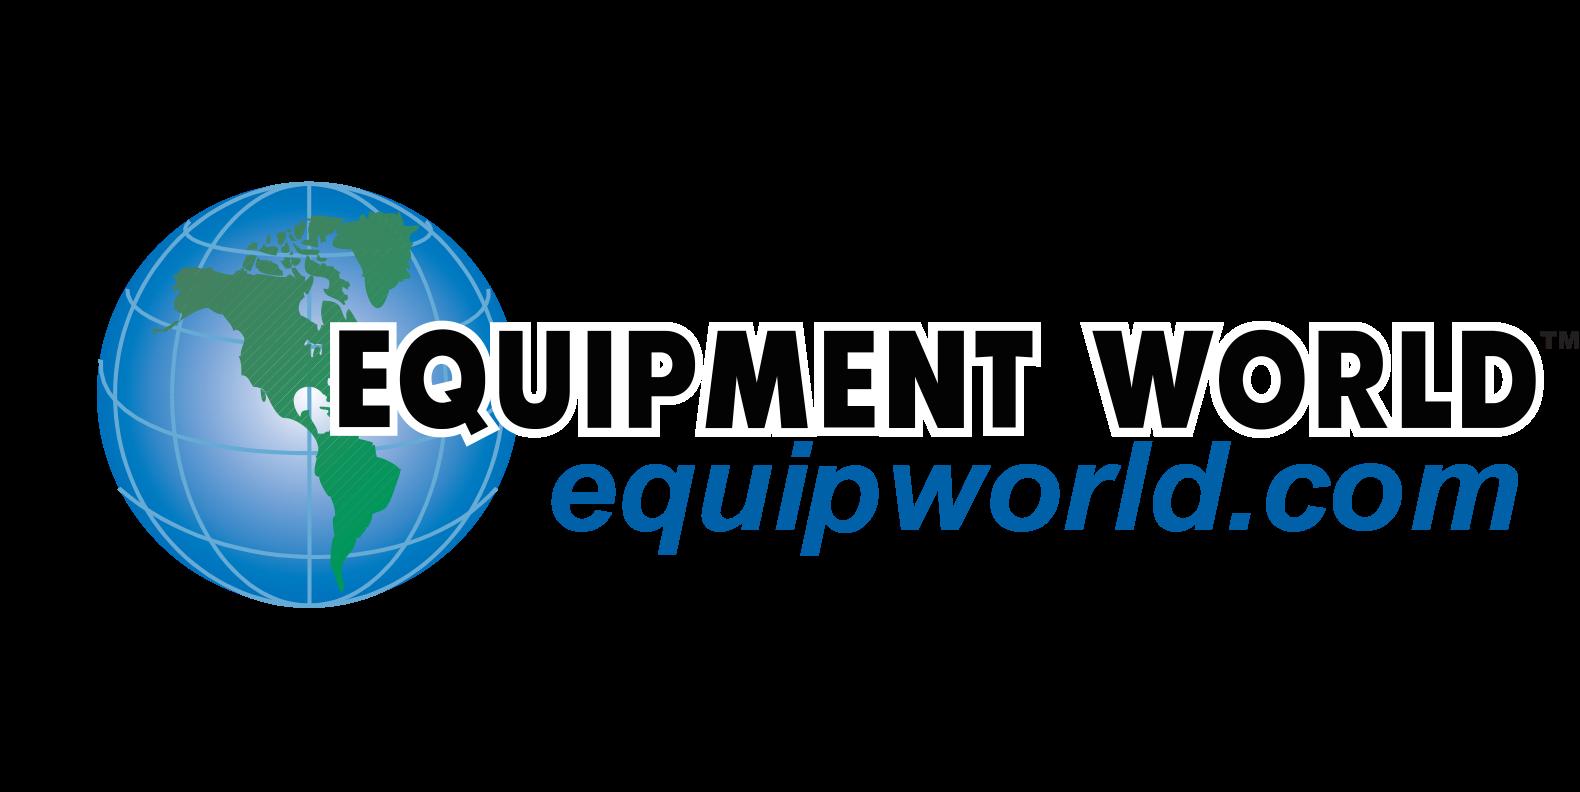 Equipment World, Inc.